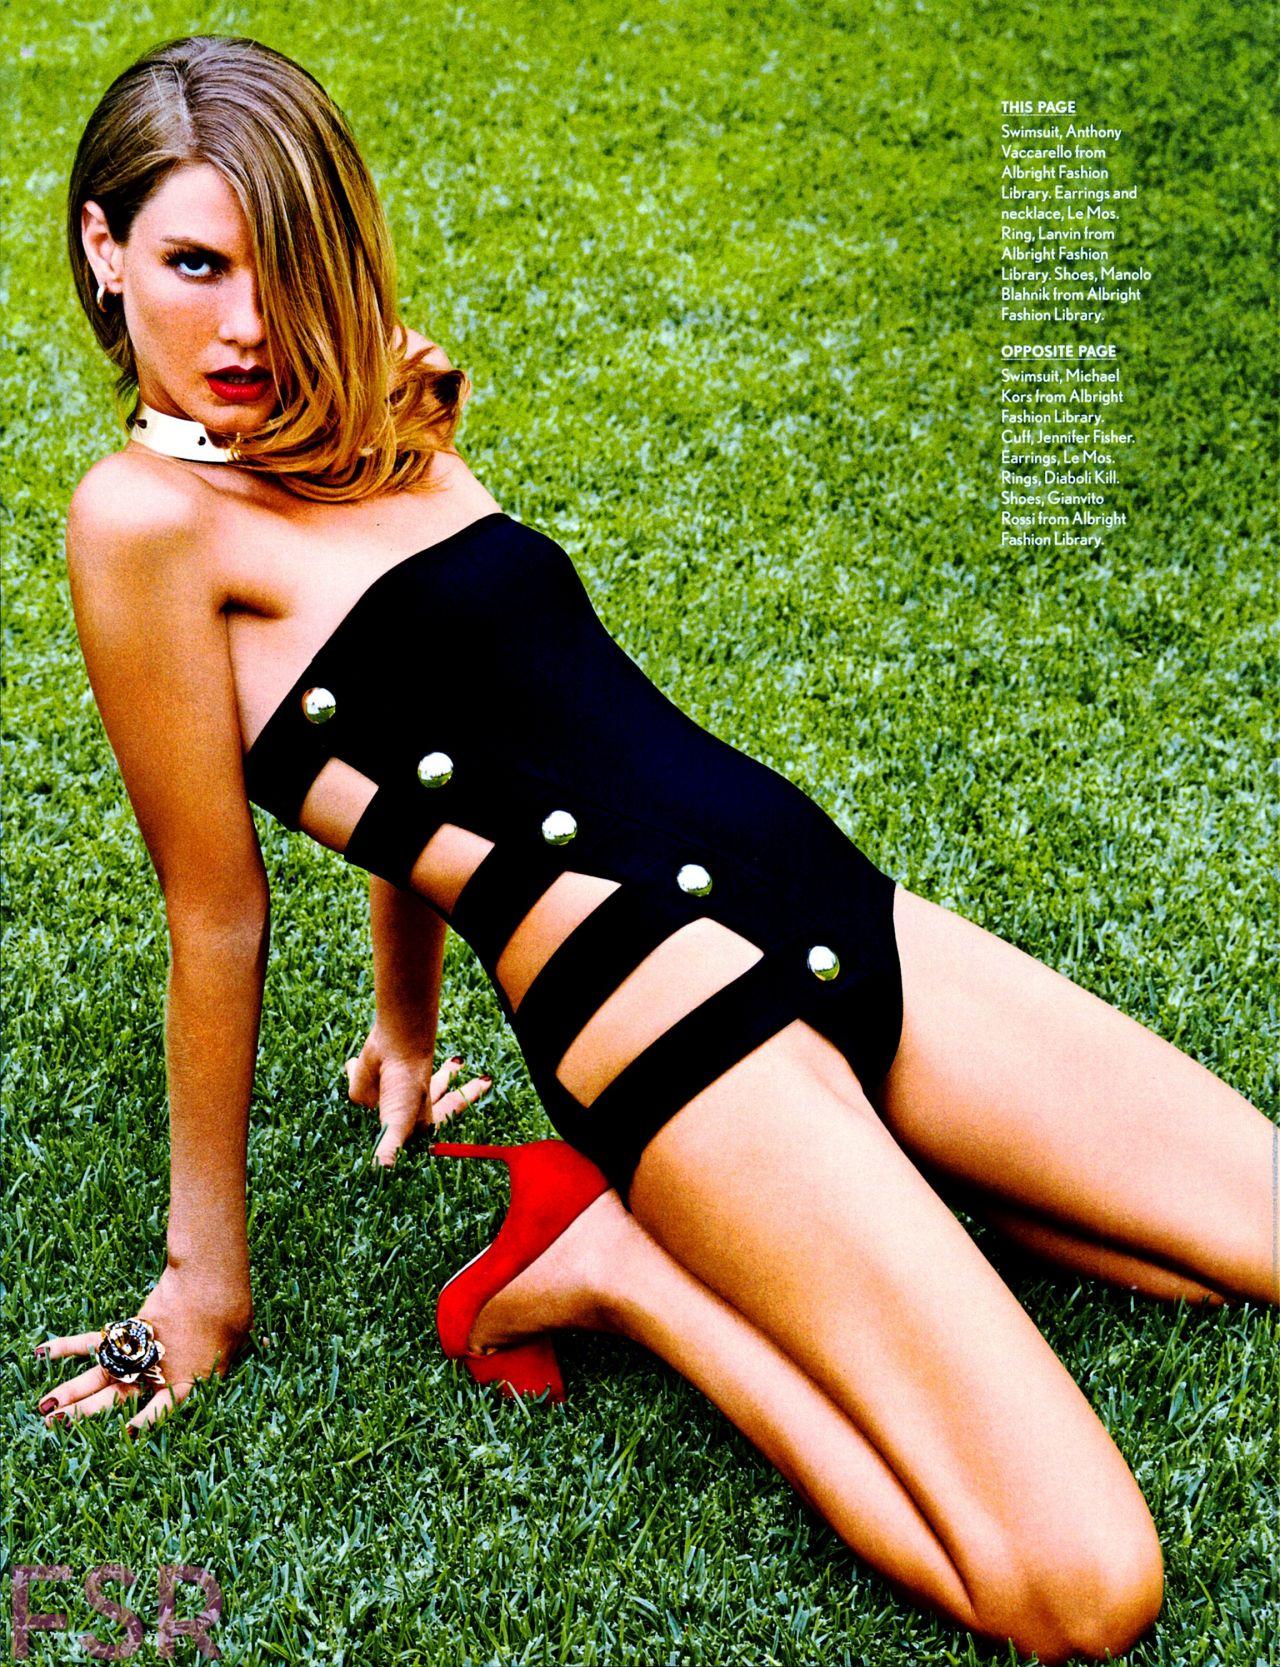 Angela lindvall maxim magazine oct 2014 by james macari hq photo shoot nudes (61 images)